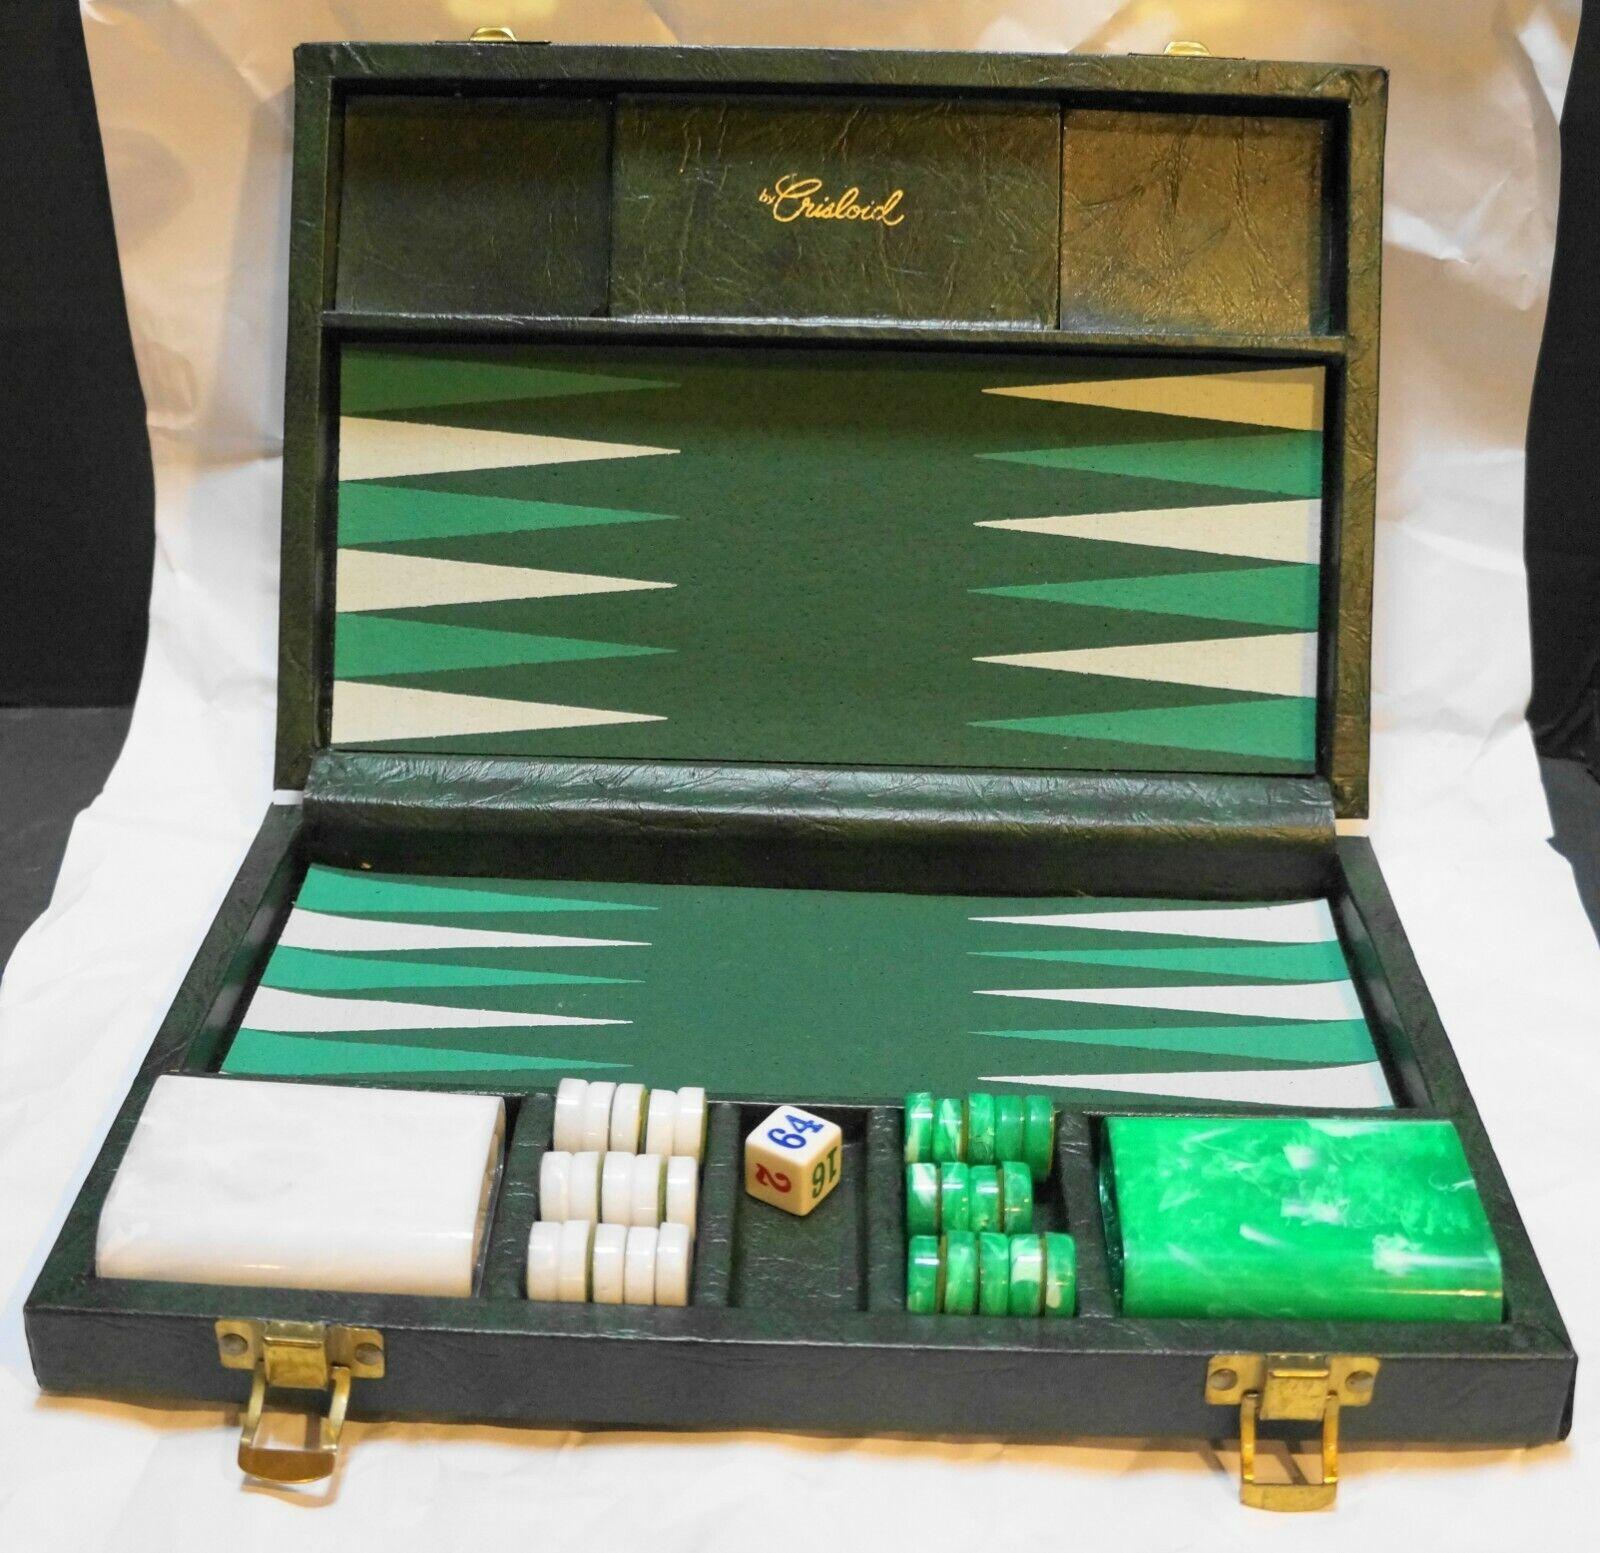 Crisloid verde bianca Marble Catalin Backgammon Set quasi completo